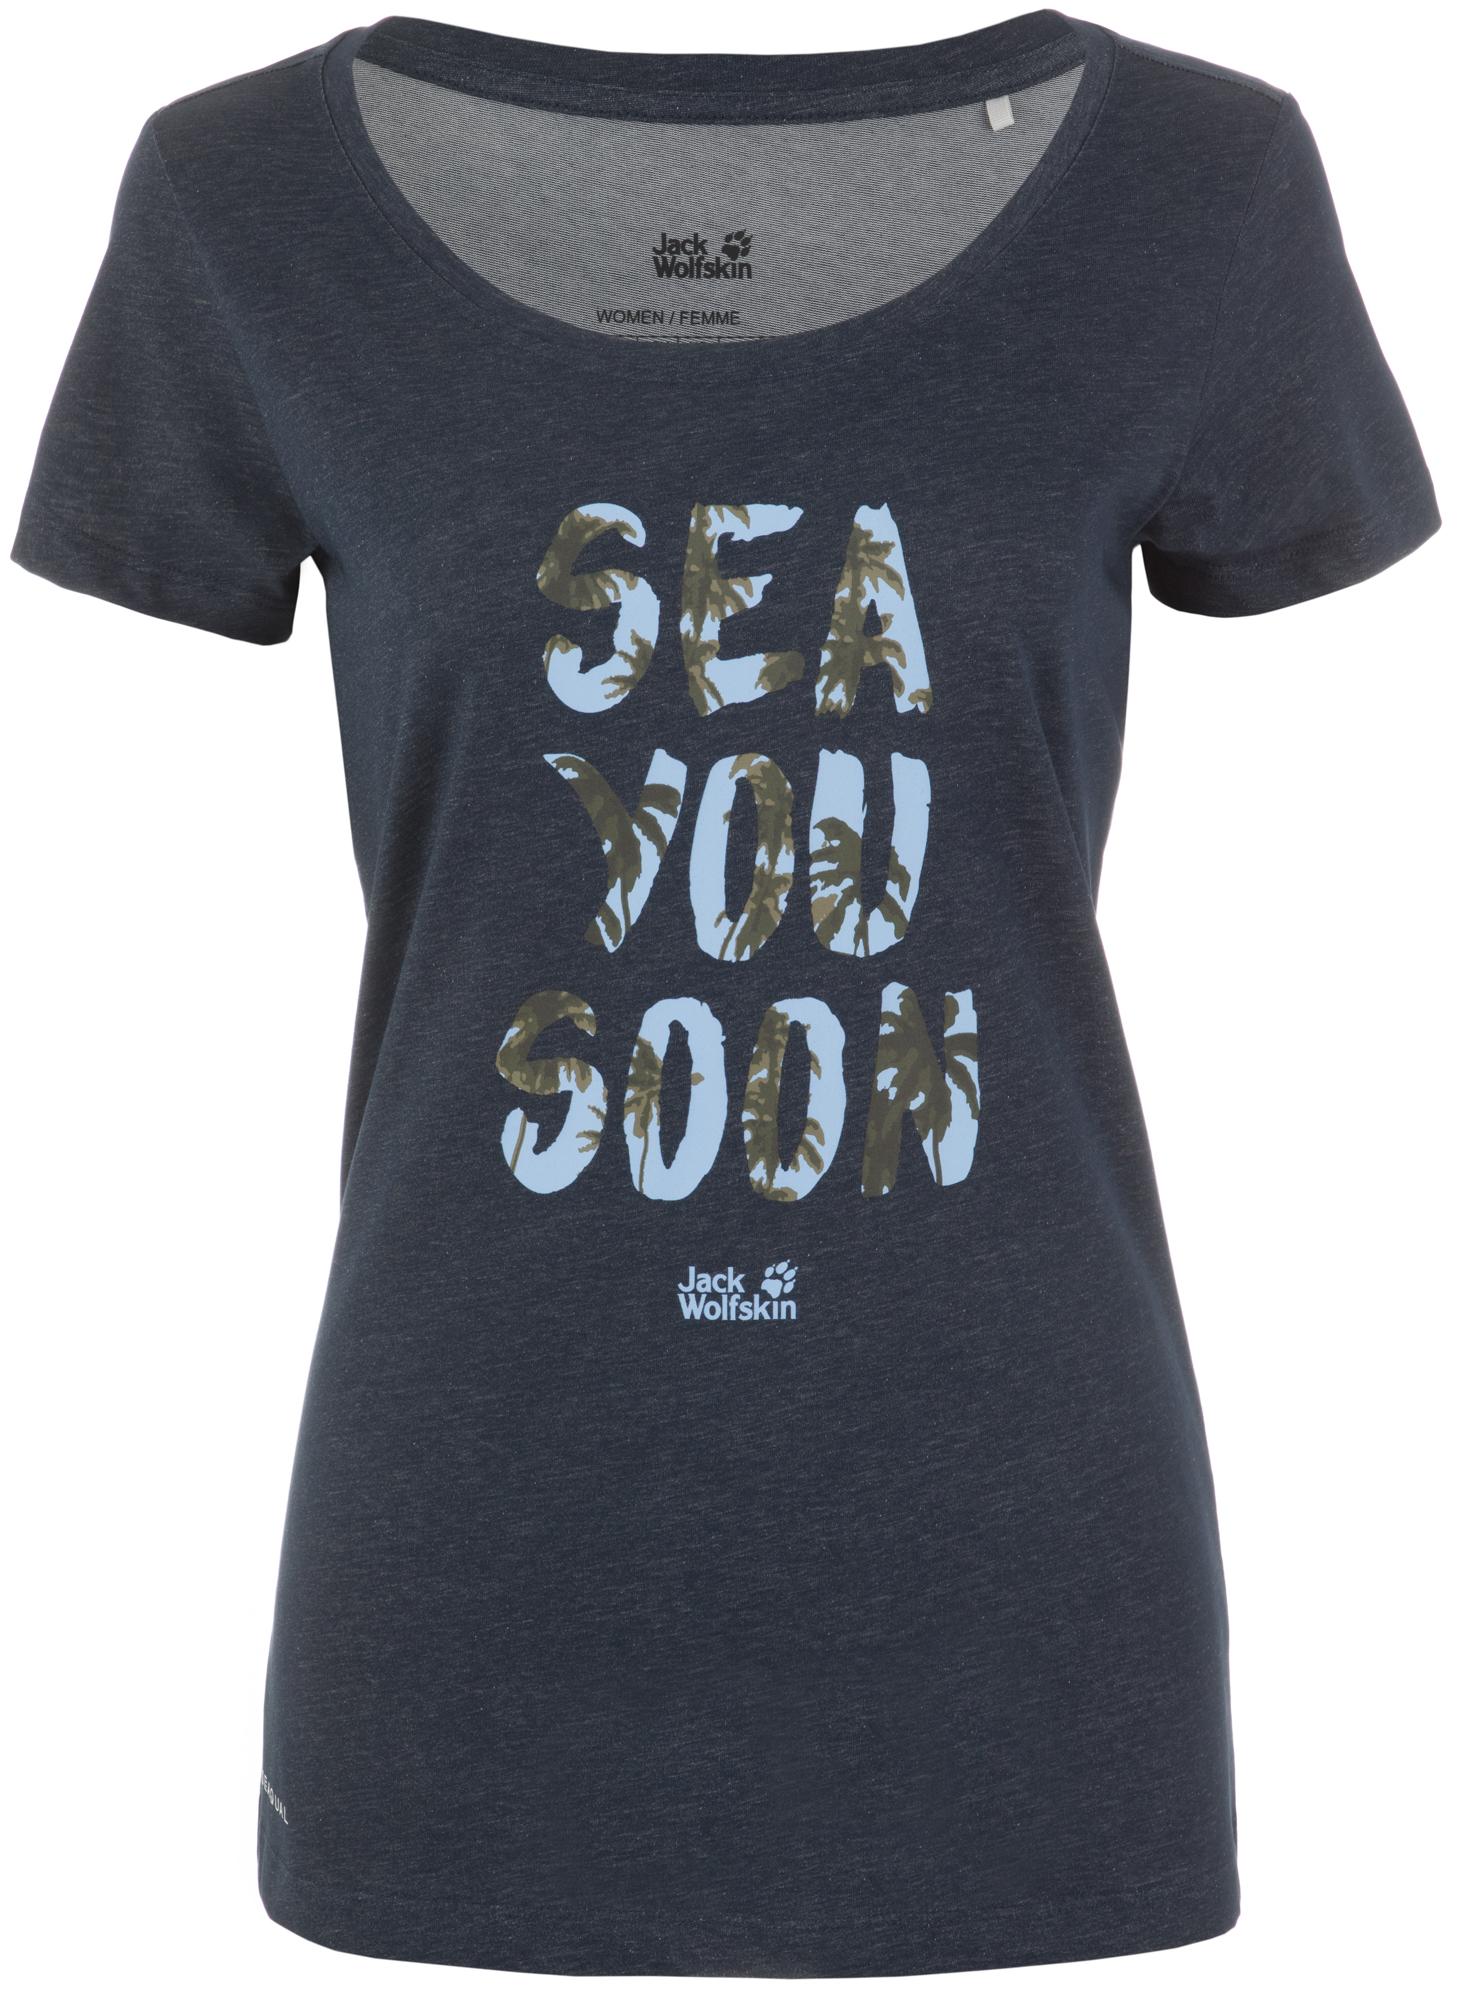 JACK WOLFSKIN Футболка женская Jack Wolfskin Sea You Soon, размер 52-54 футболка jack